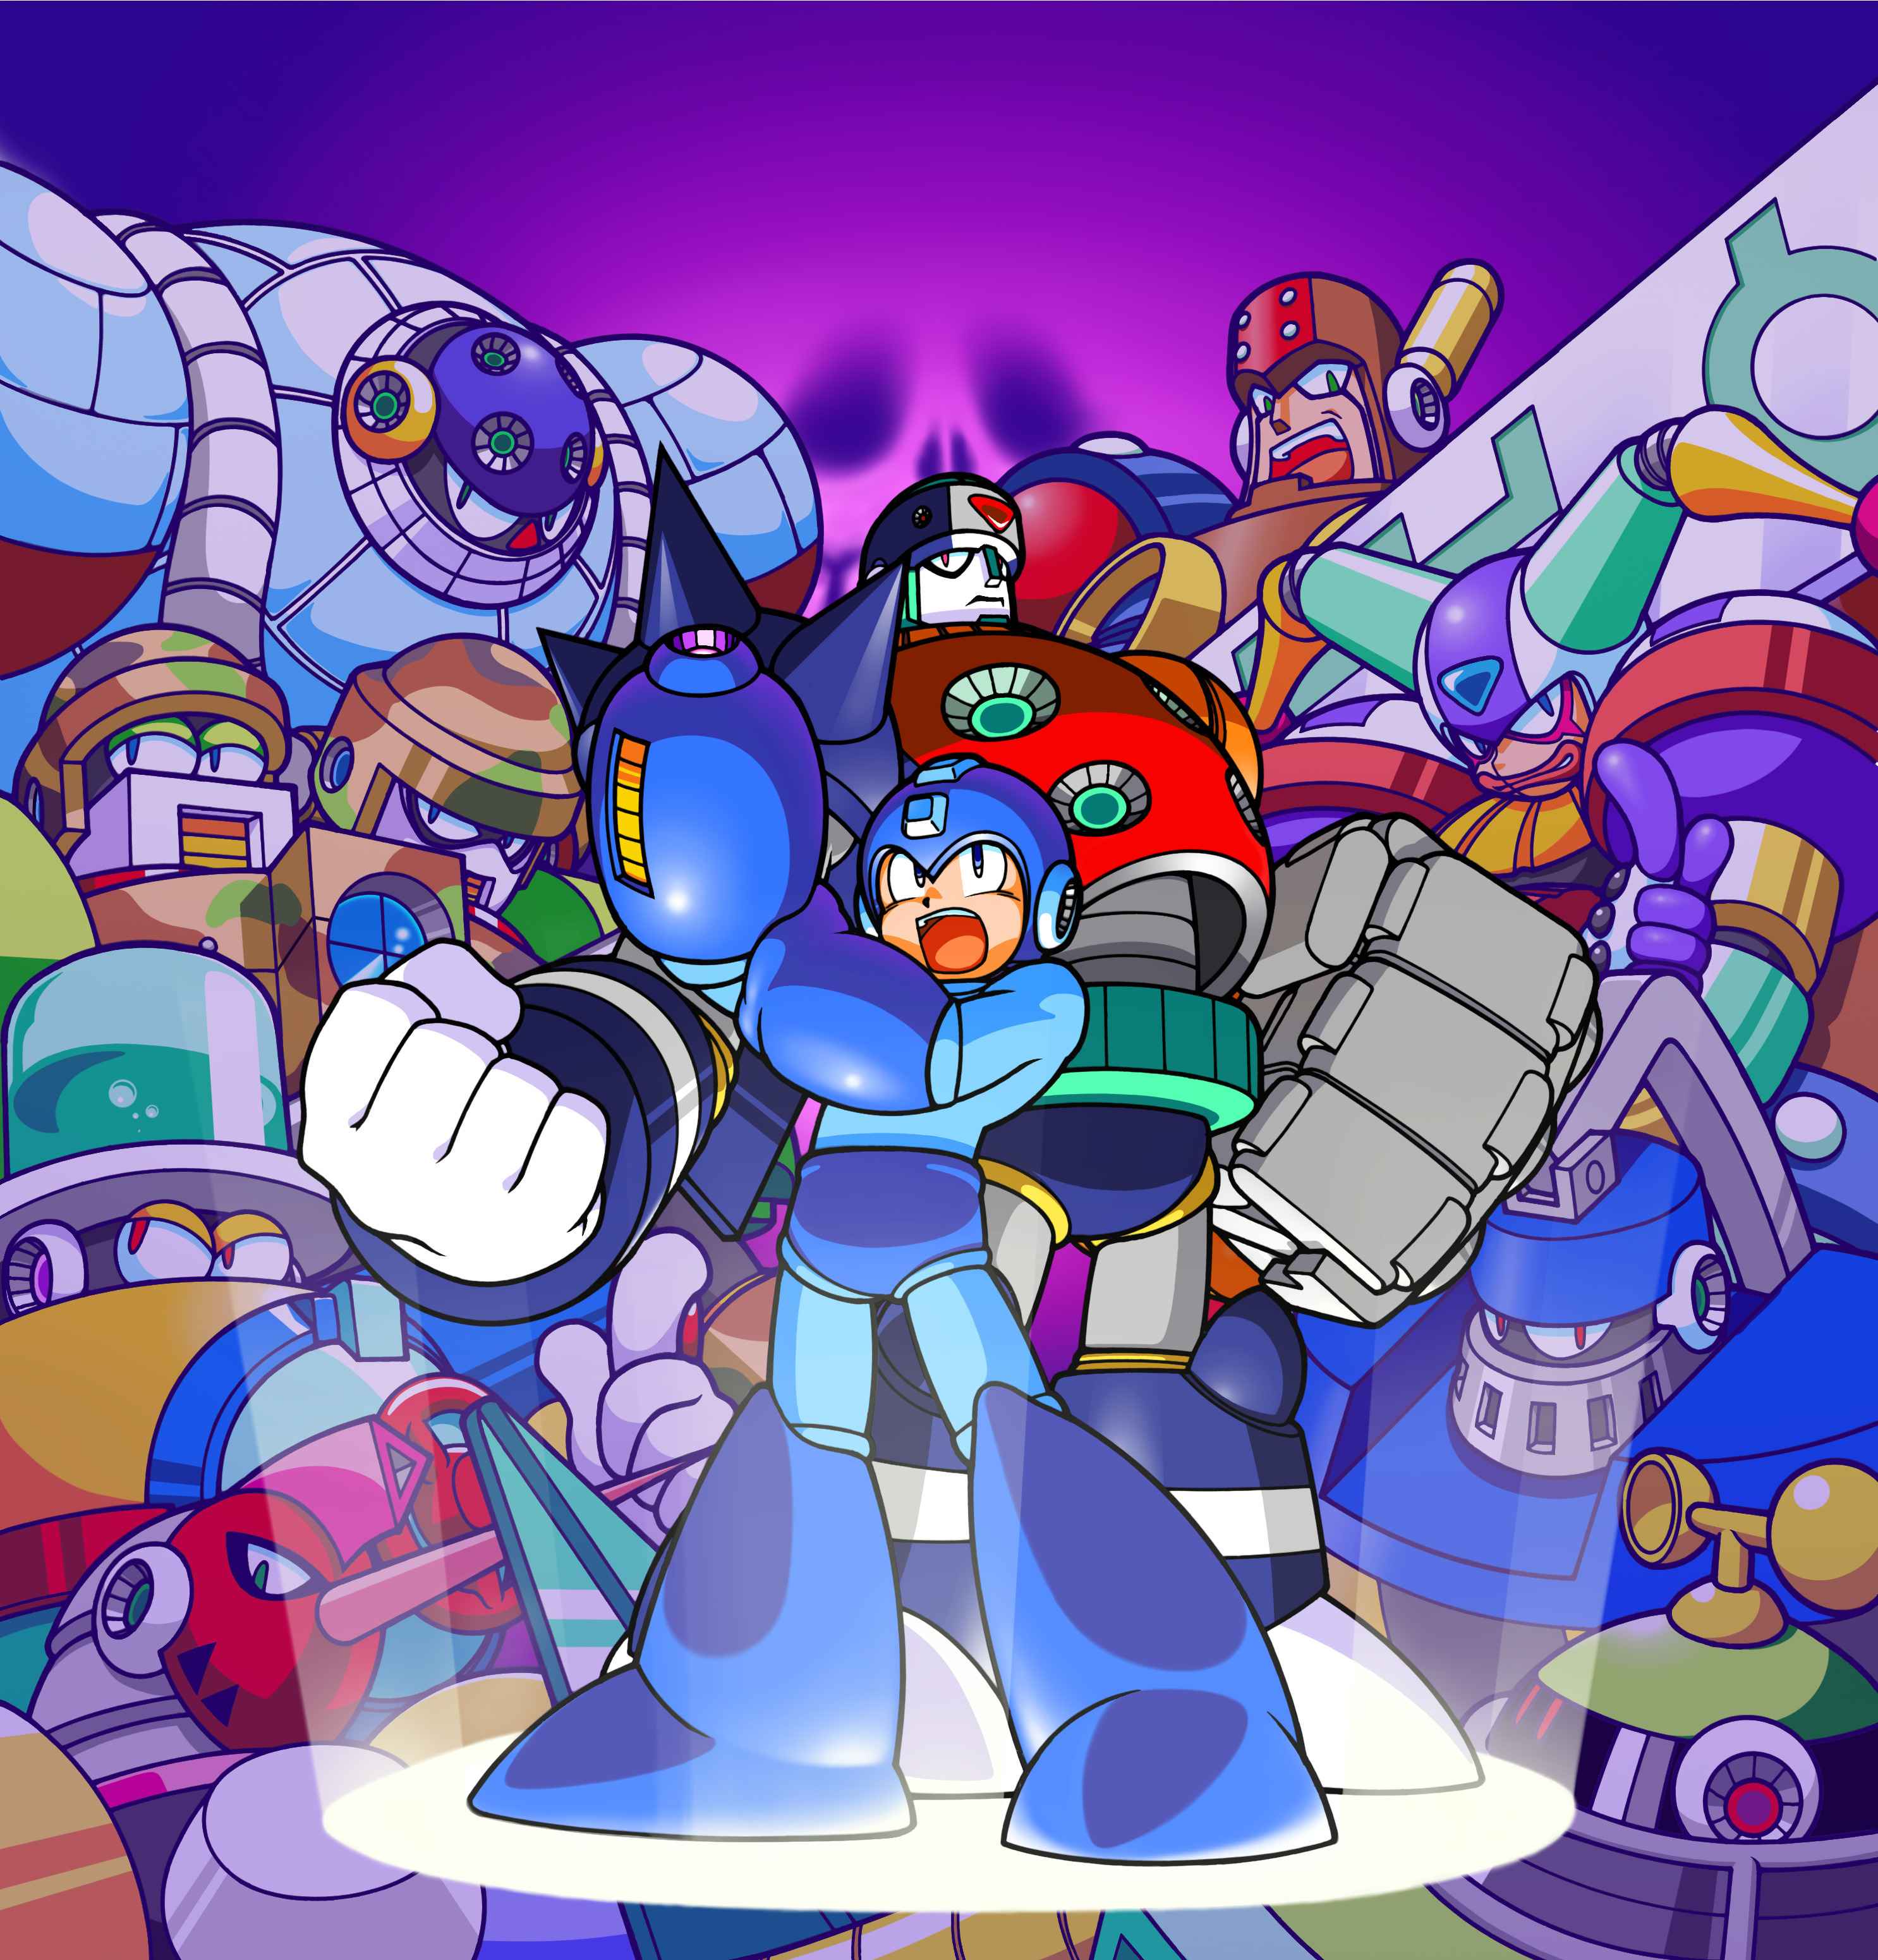 Mega man 8 mmkb fandom powered by wikia - Megaman wikia ...